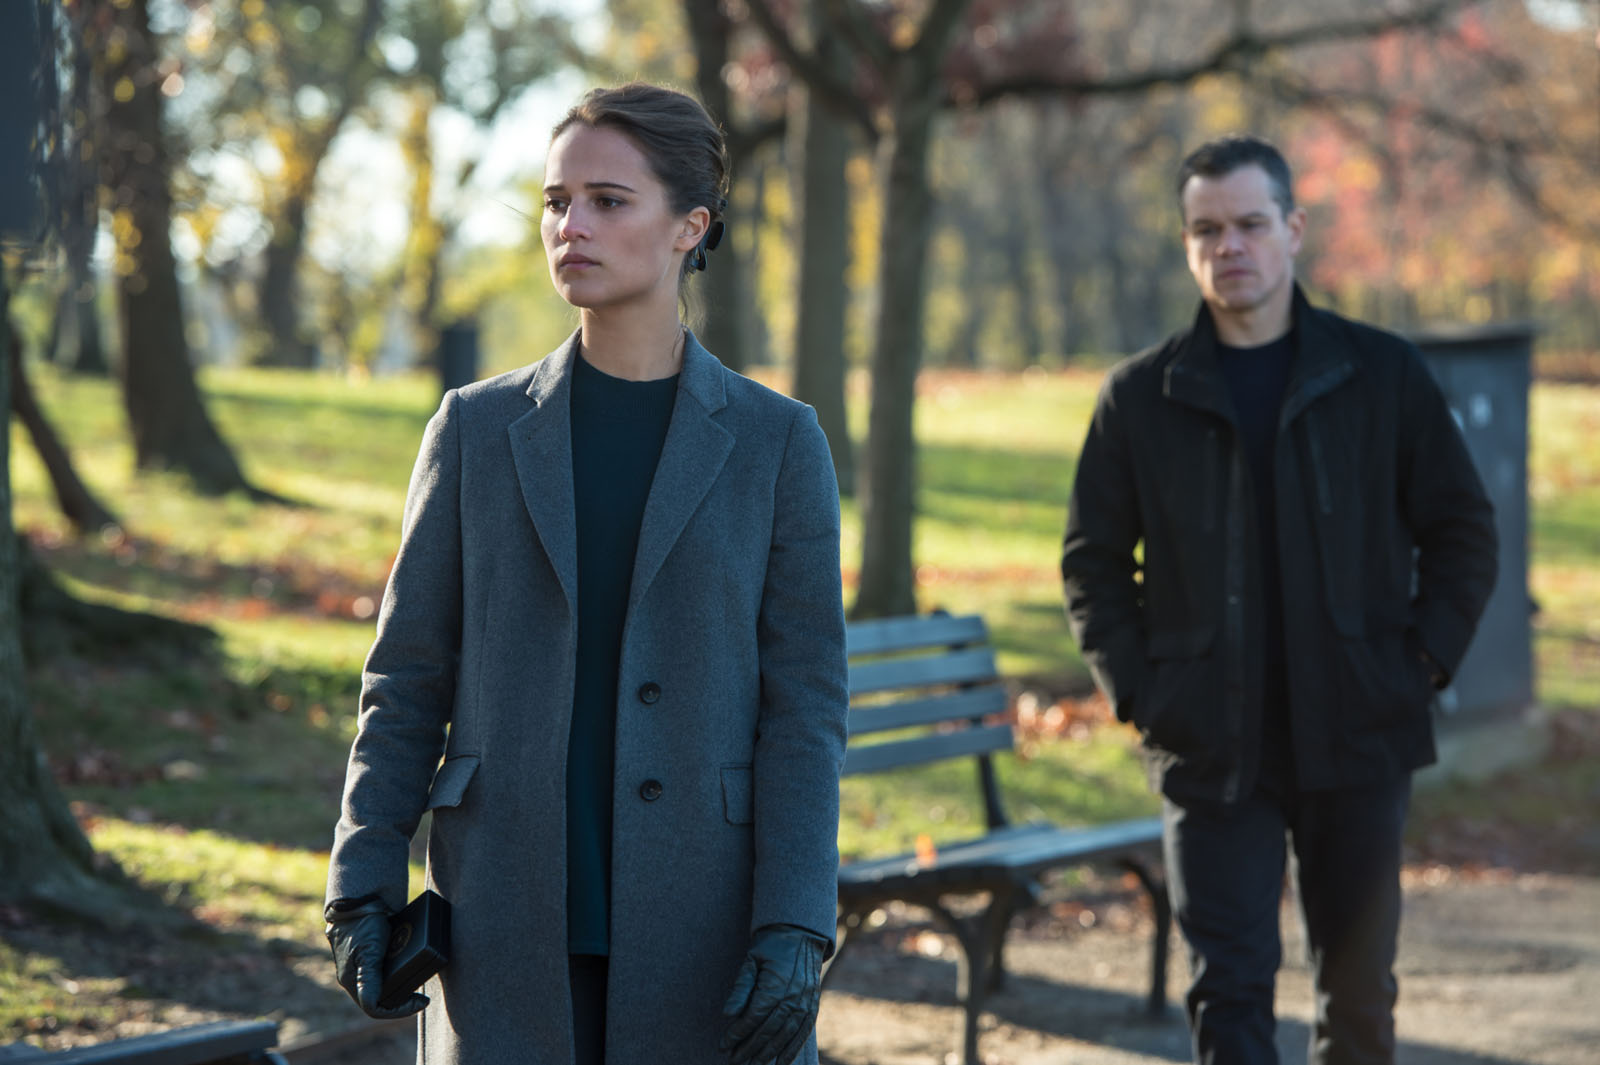 Jason Bourne - Alicia Vikander